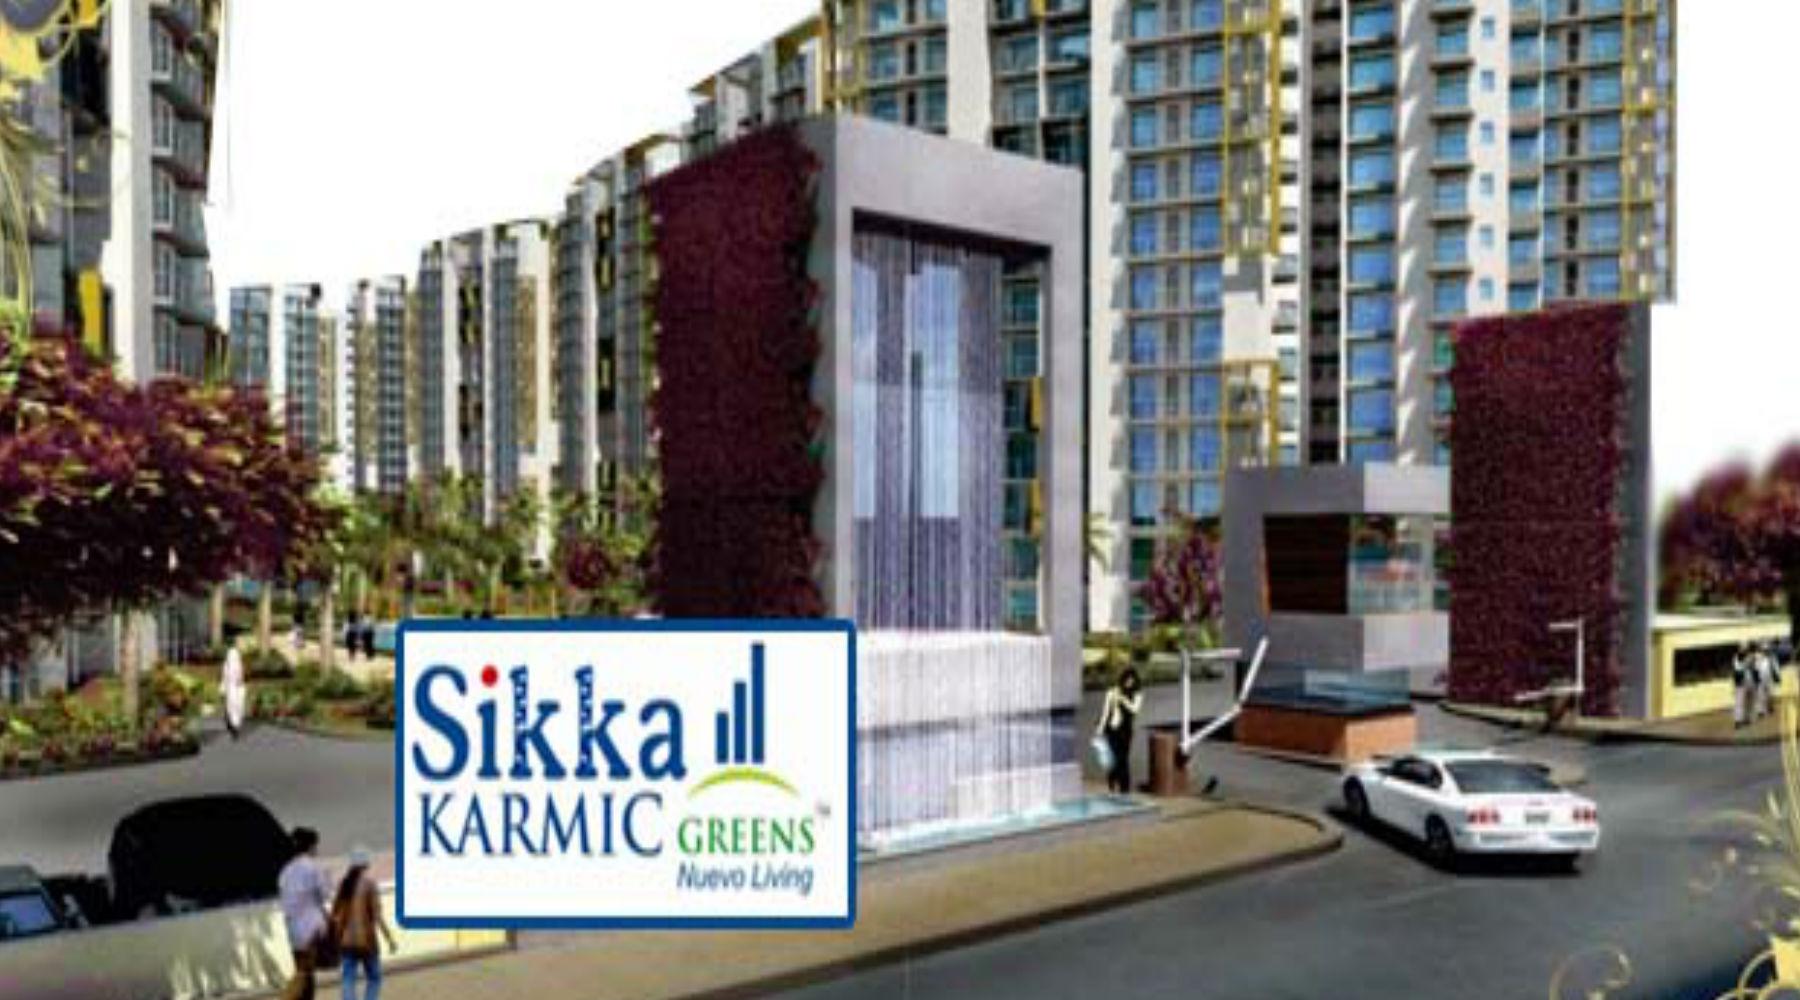 sikka-karmic-greens